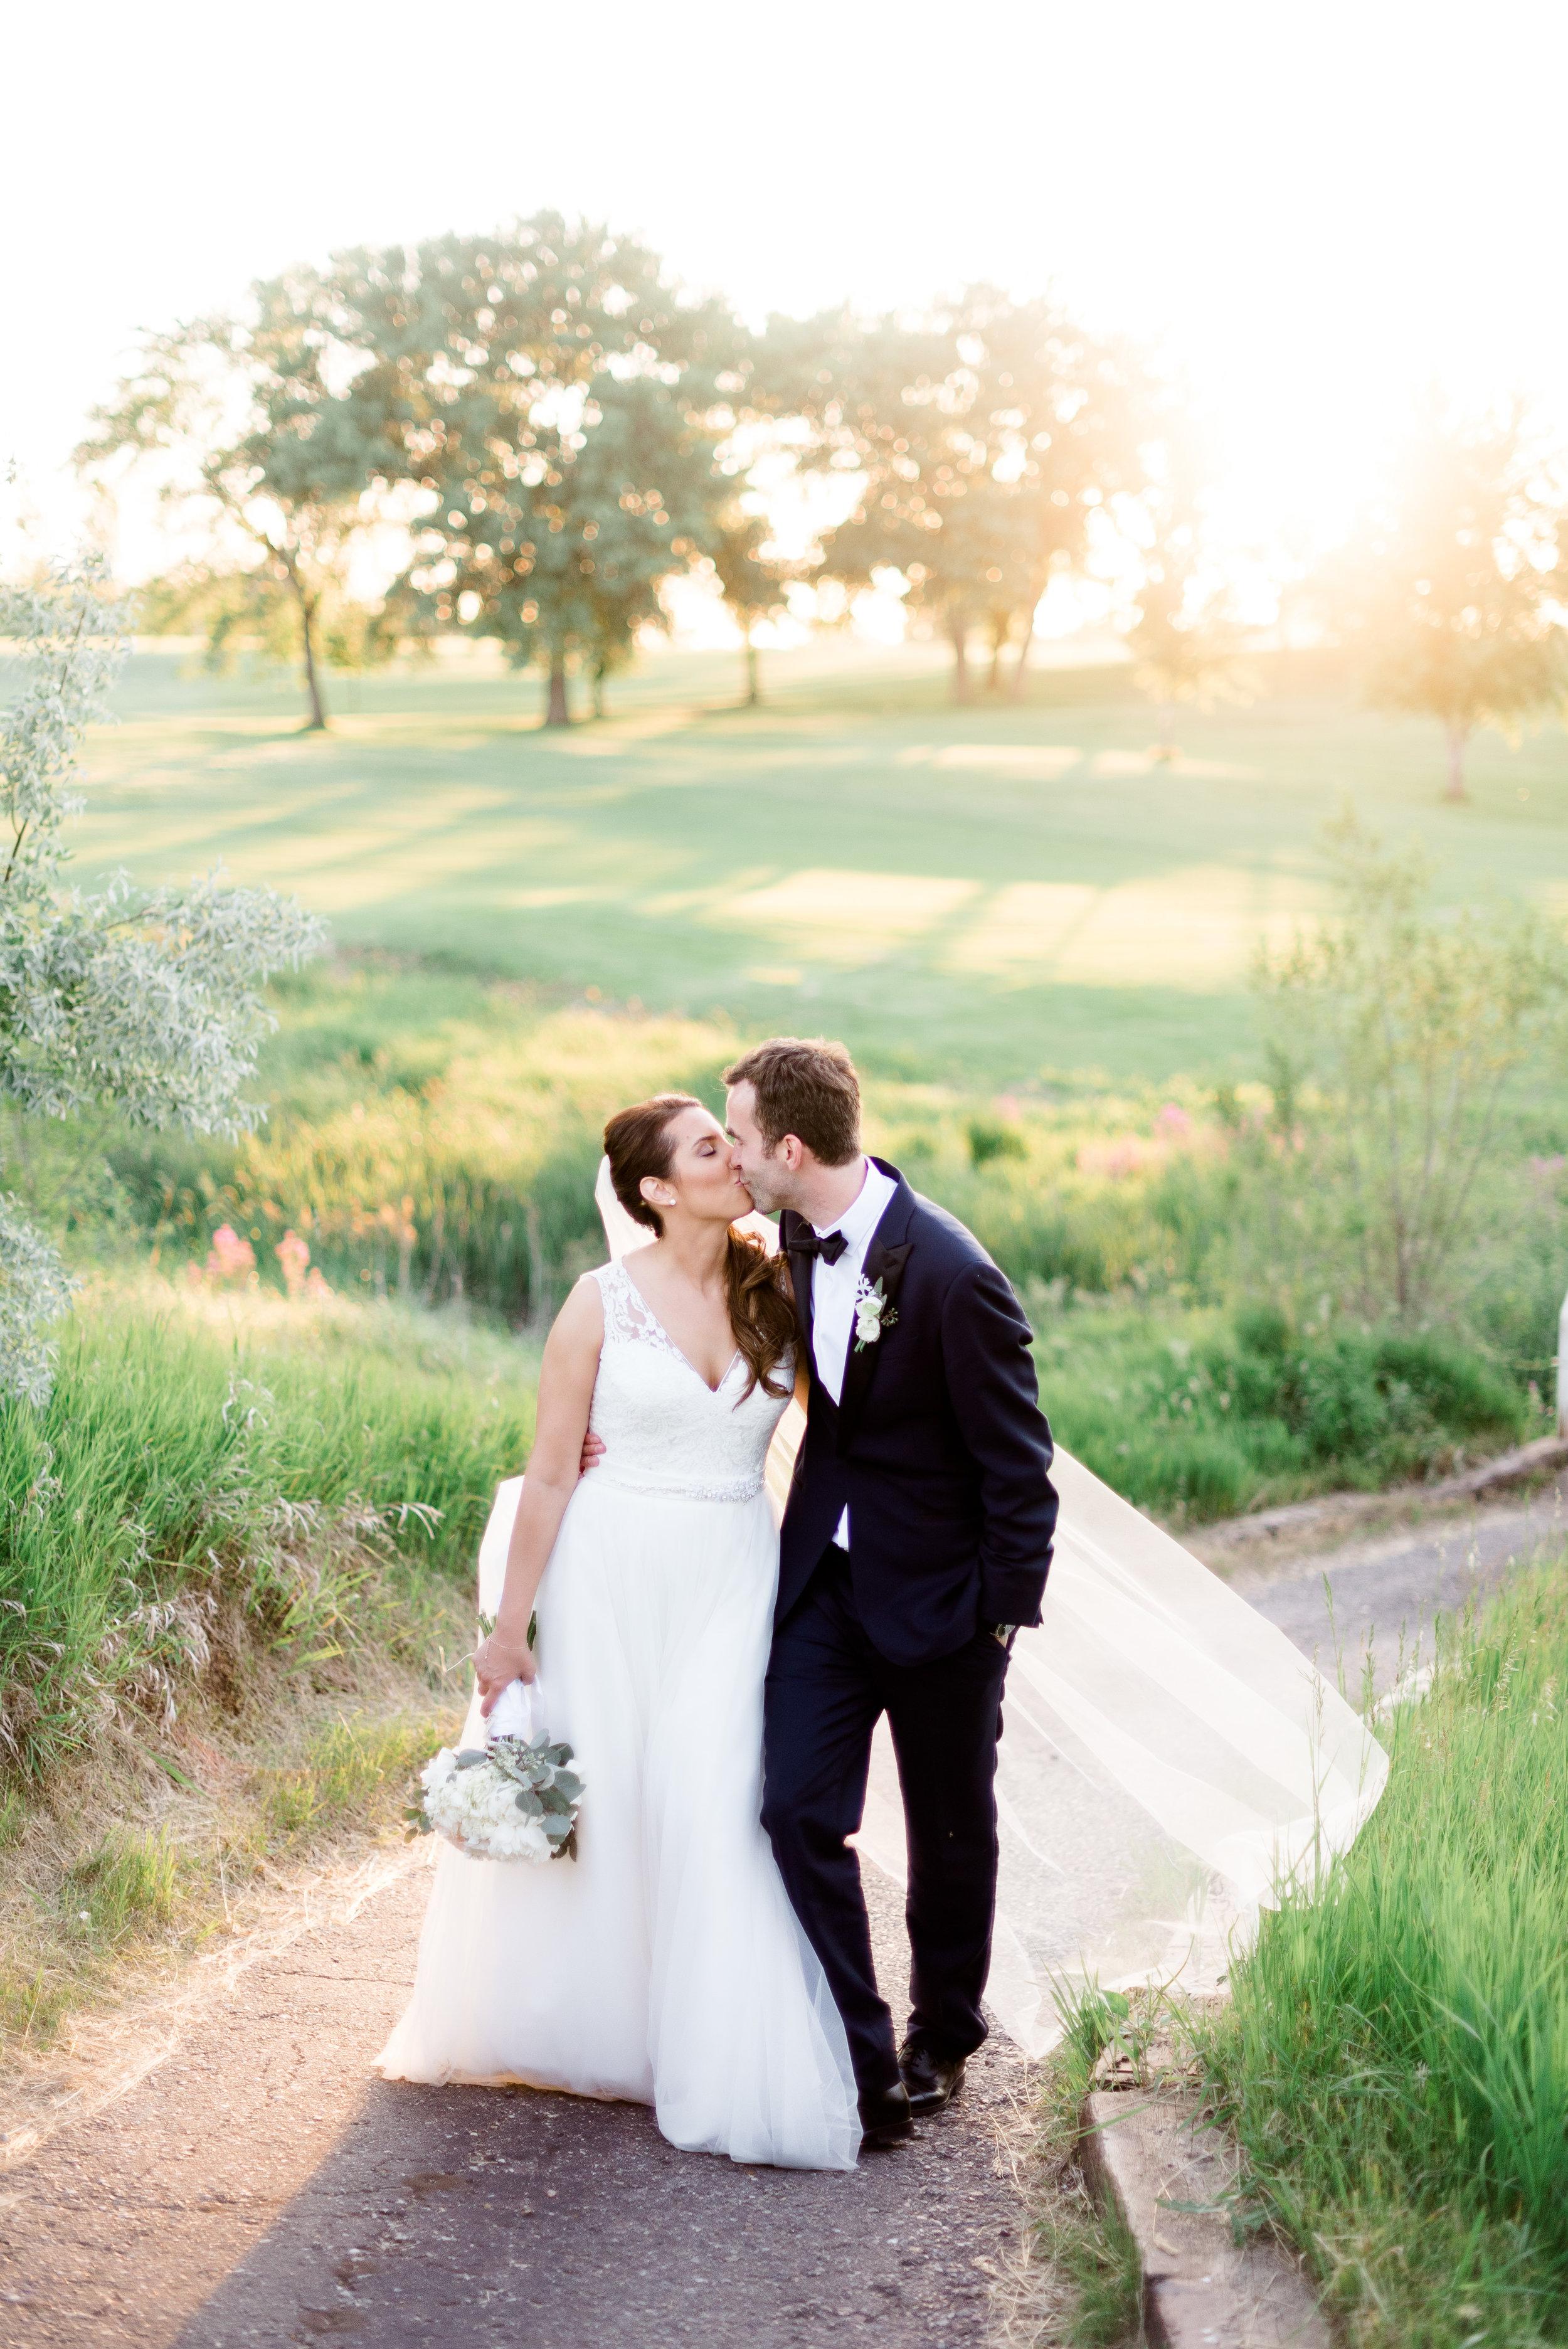 Anthony-and-stork-Weddings-589.jpg